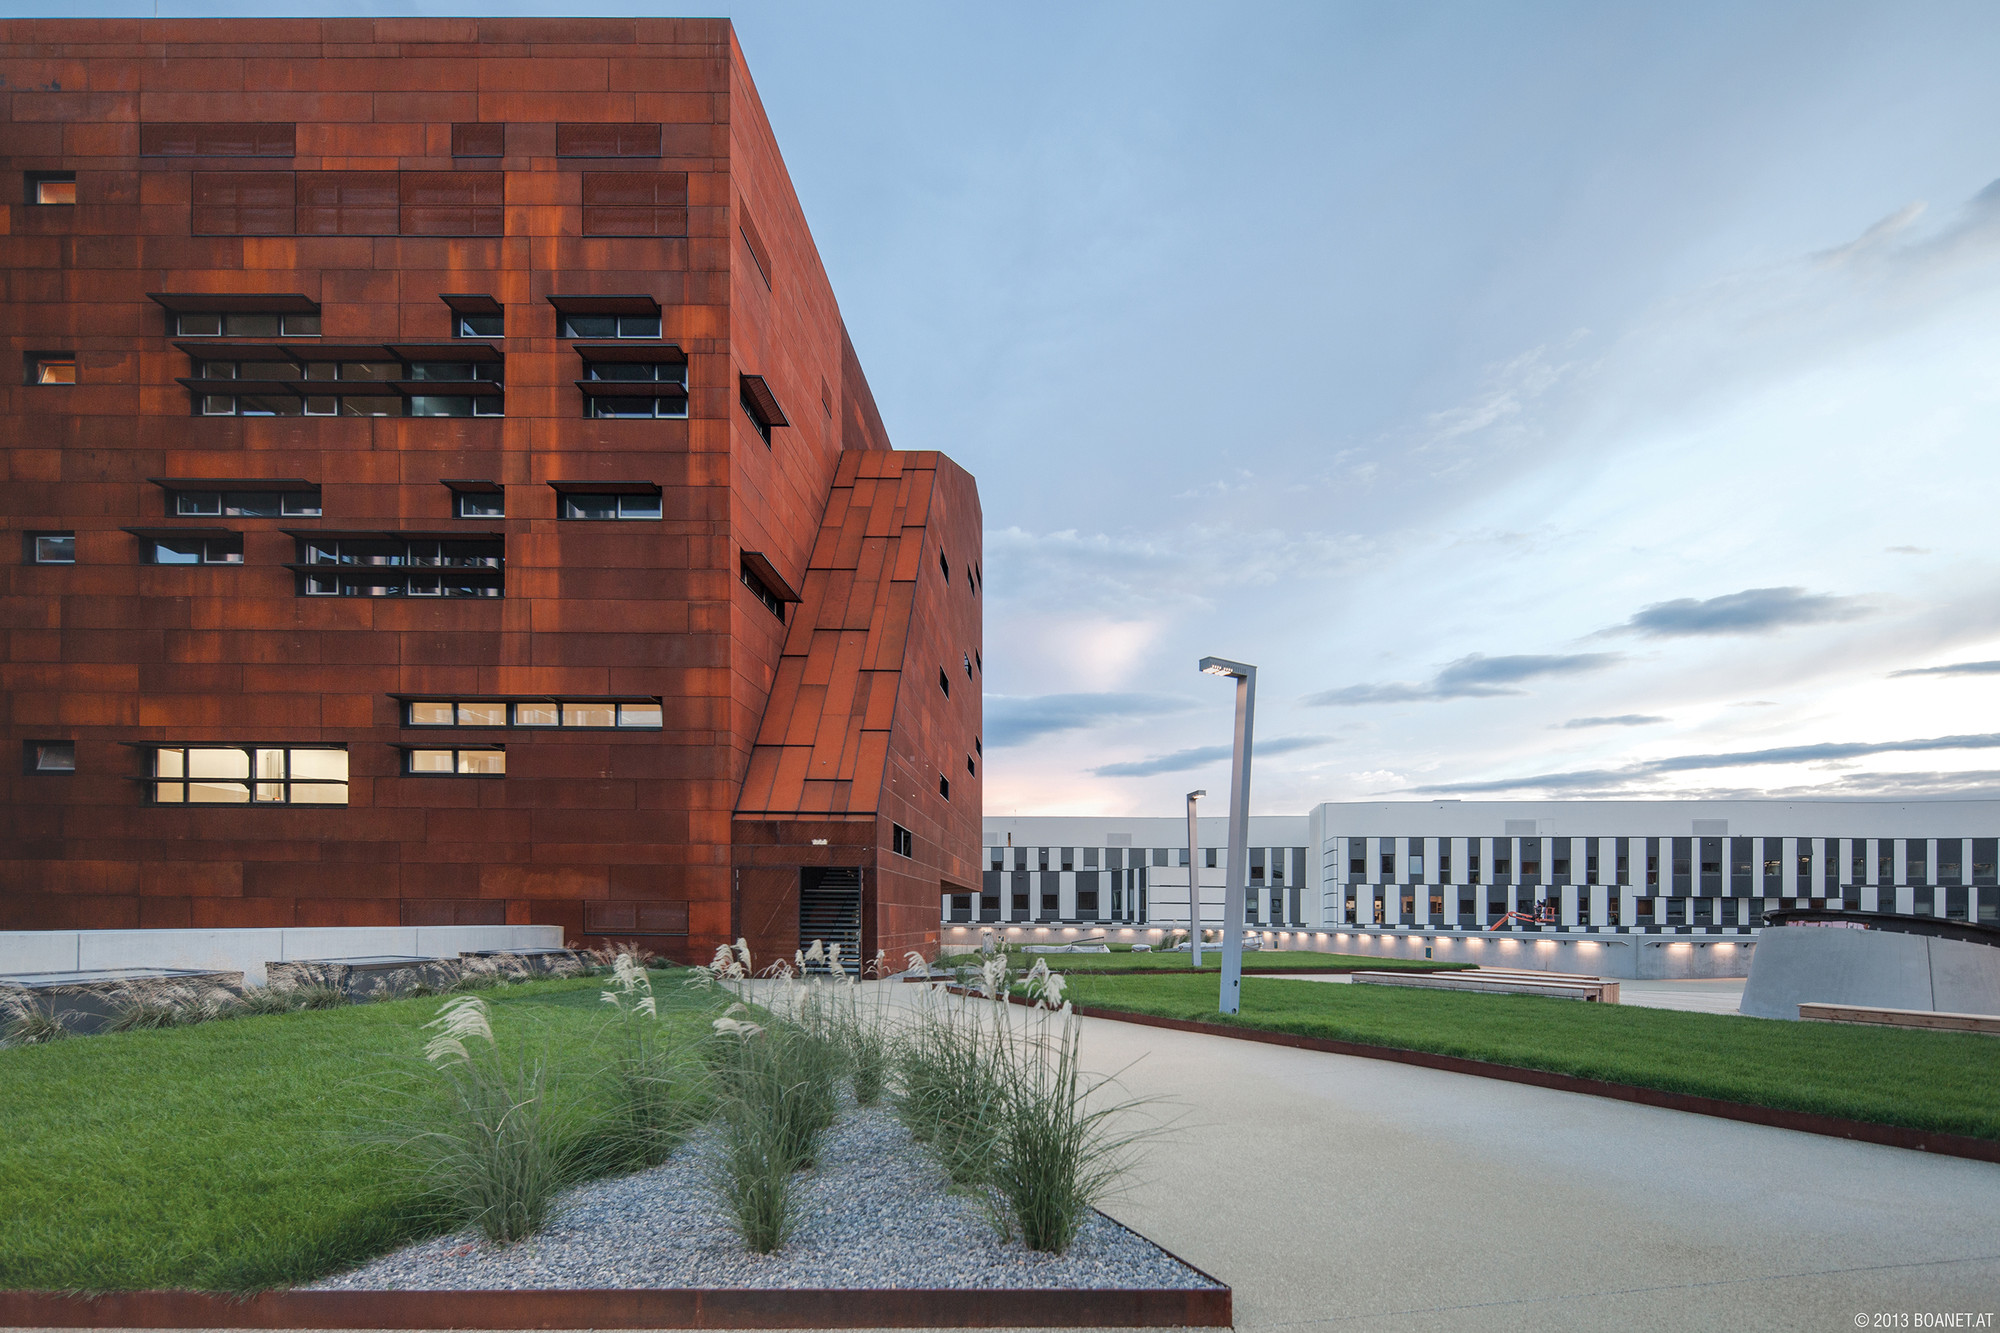 Auditorium Center in WU Campus / BUSarchitektur, Courtesy of BOAnet.at